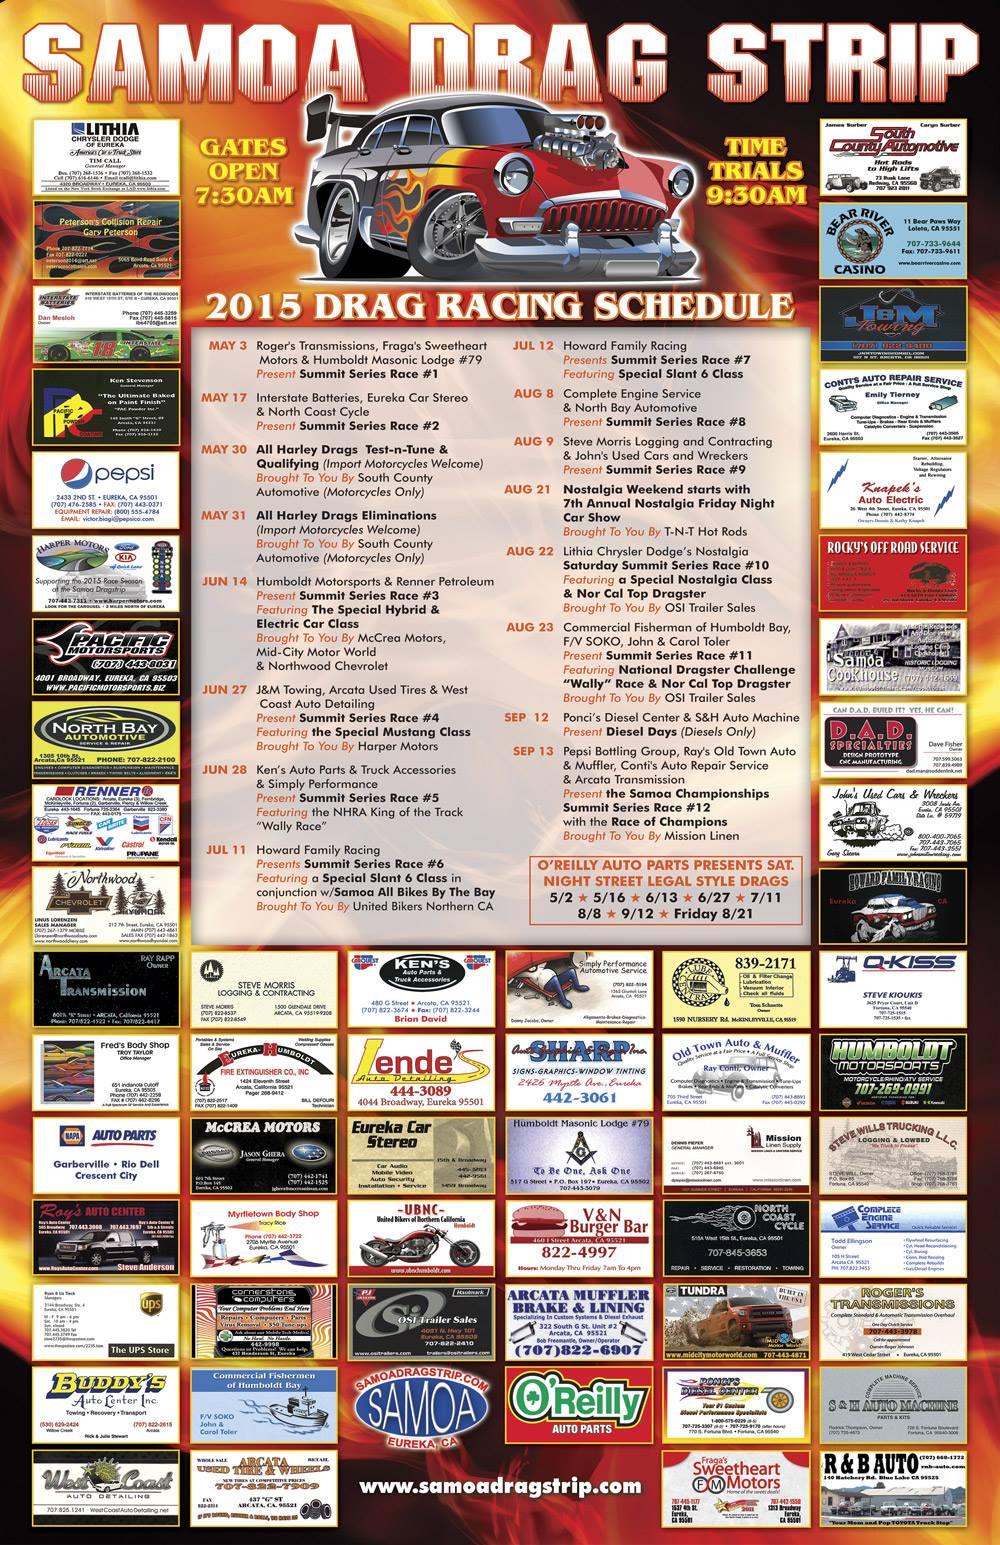 Samoa Dragstrip 2015 Calendar